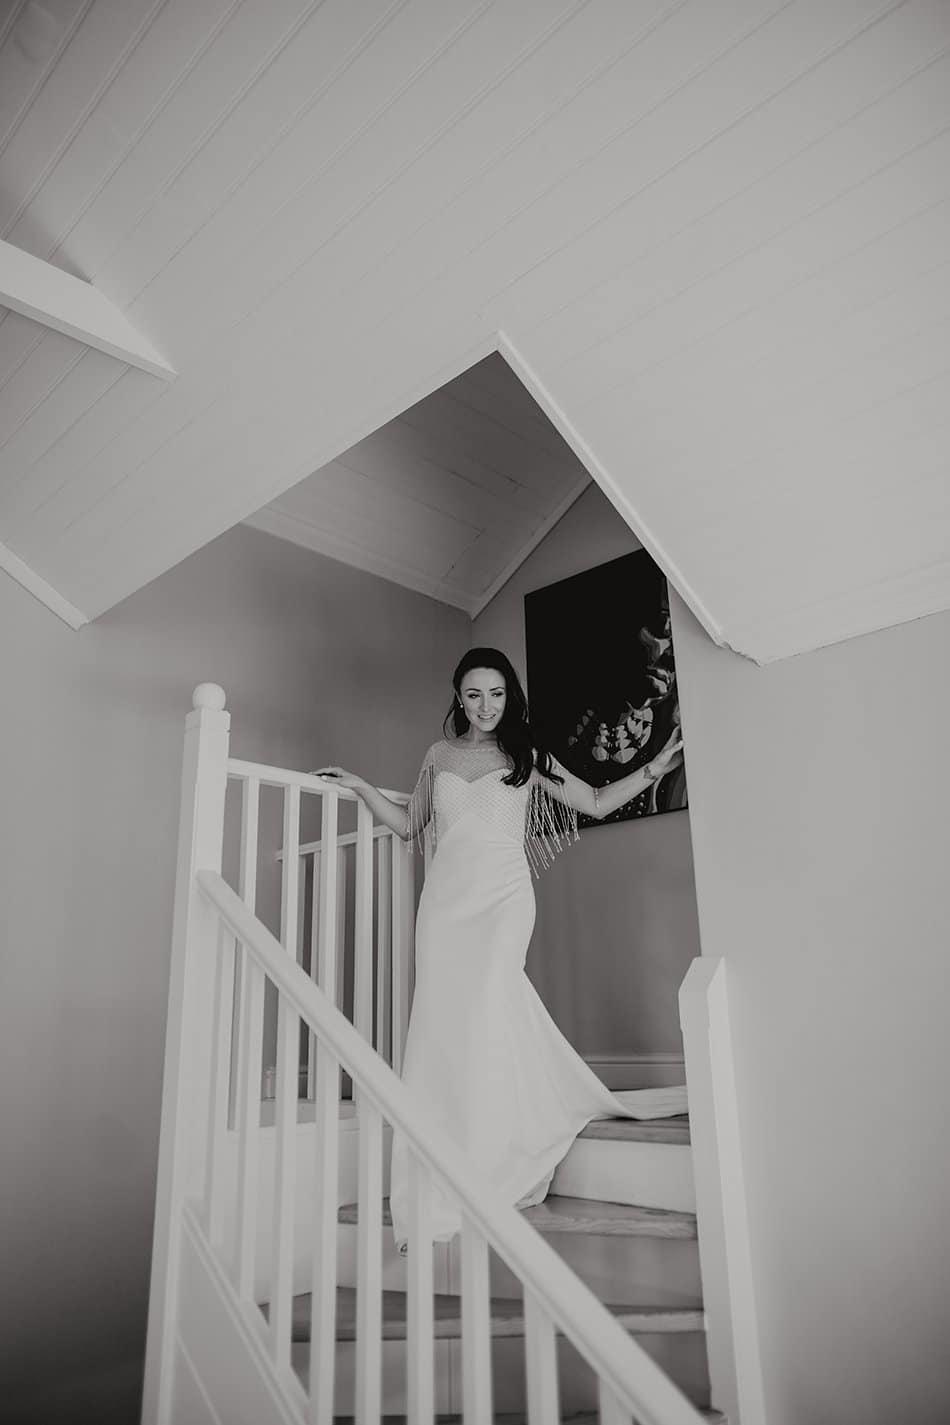 suikerbossie wedding venue hout bay - cape town wedding photographers - duane smith photography - wedding packages - somerset west wedding photographers 217